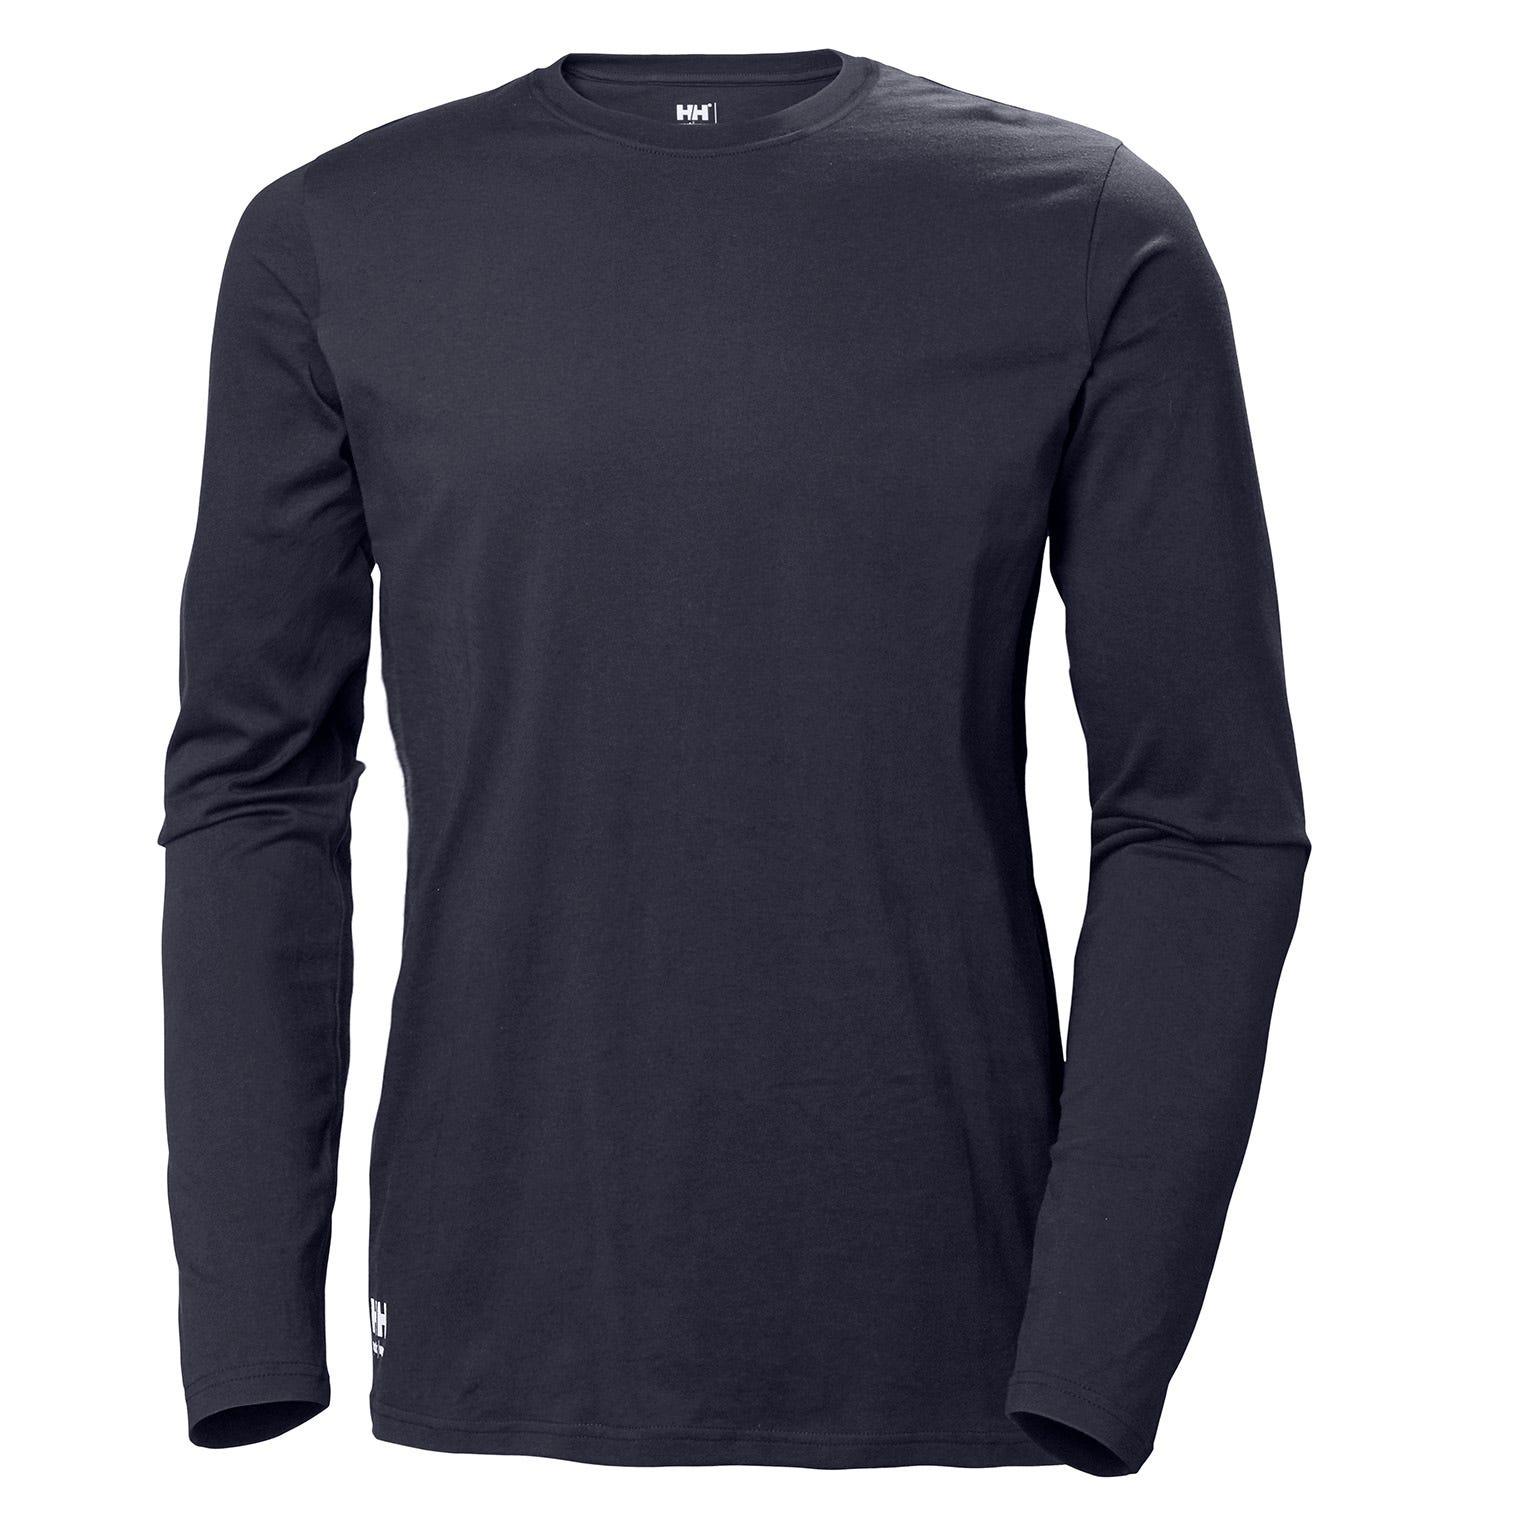 HH Workwear Helly Hansen WorkwearWomen's Manchester Cotton Longsleeve Shirt Navy S